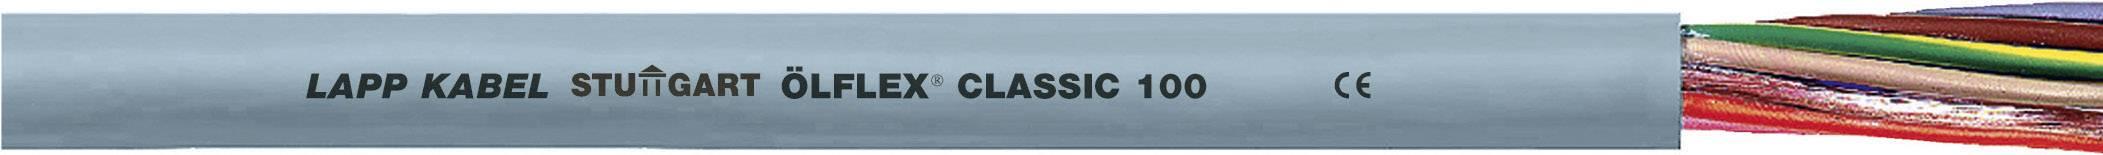 Kabel LappKabel Ölflex CLASSIC 100 4G10 (00101093), PVC, 17,6 mm, 750 V, šedá, 100 m